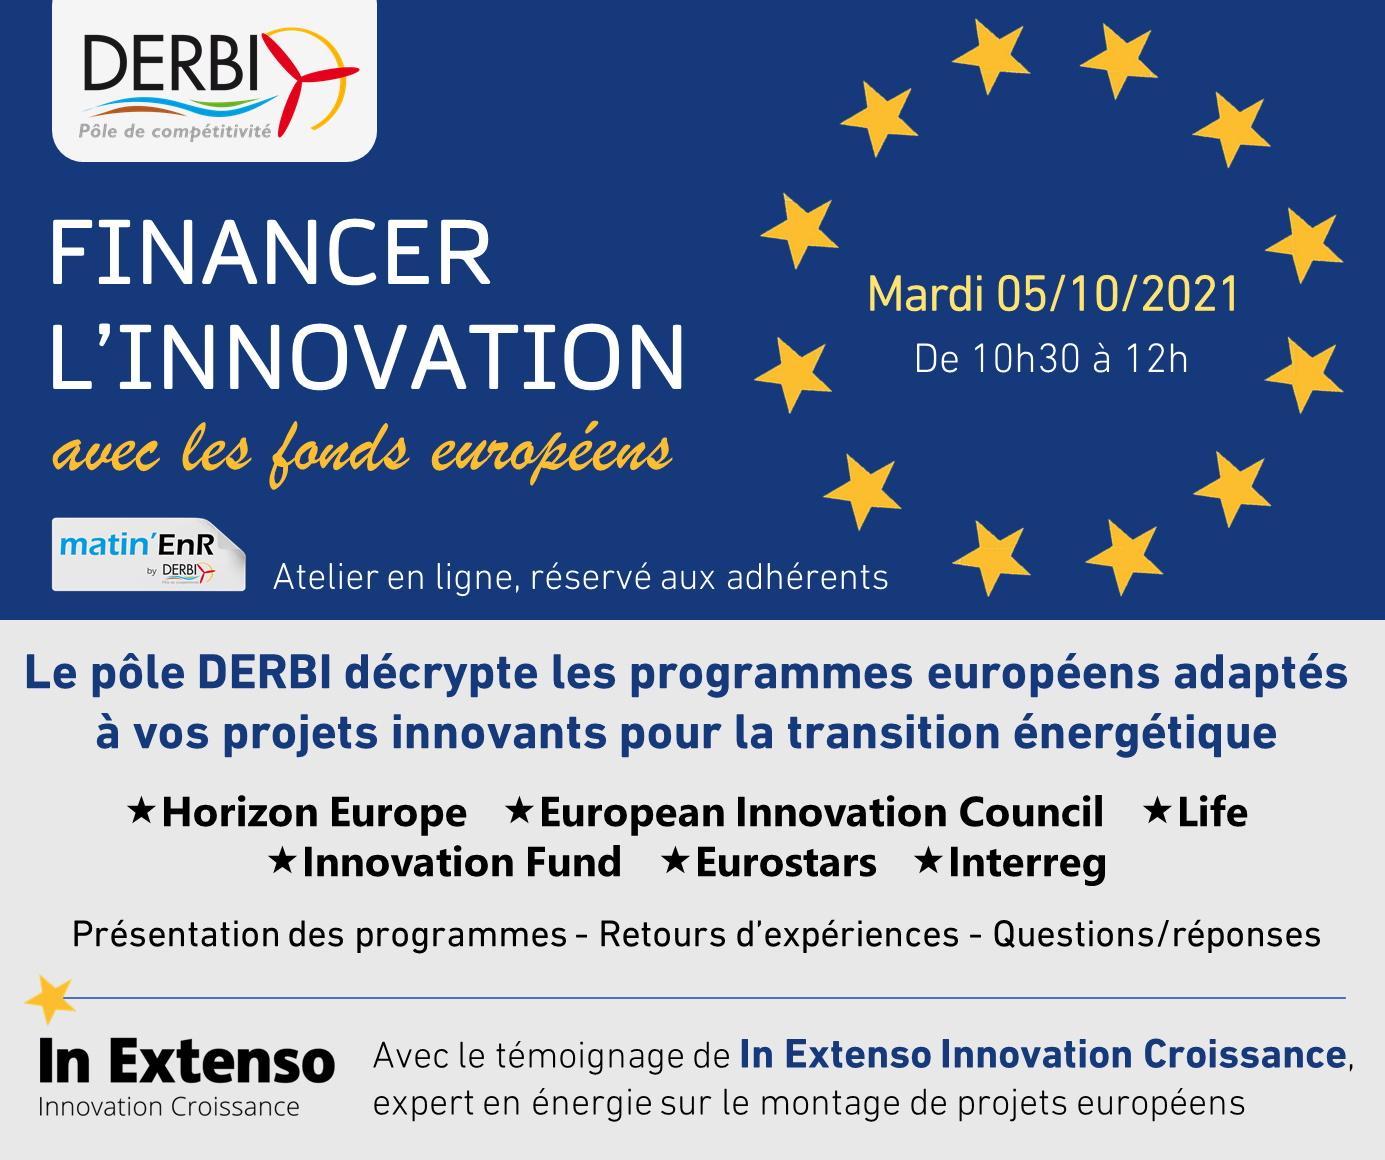 Financer l'innovation avec les fonds européens